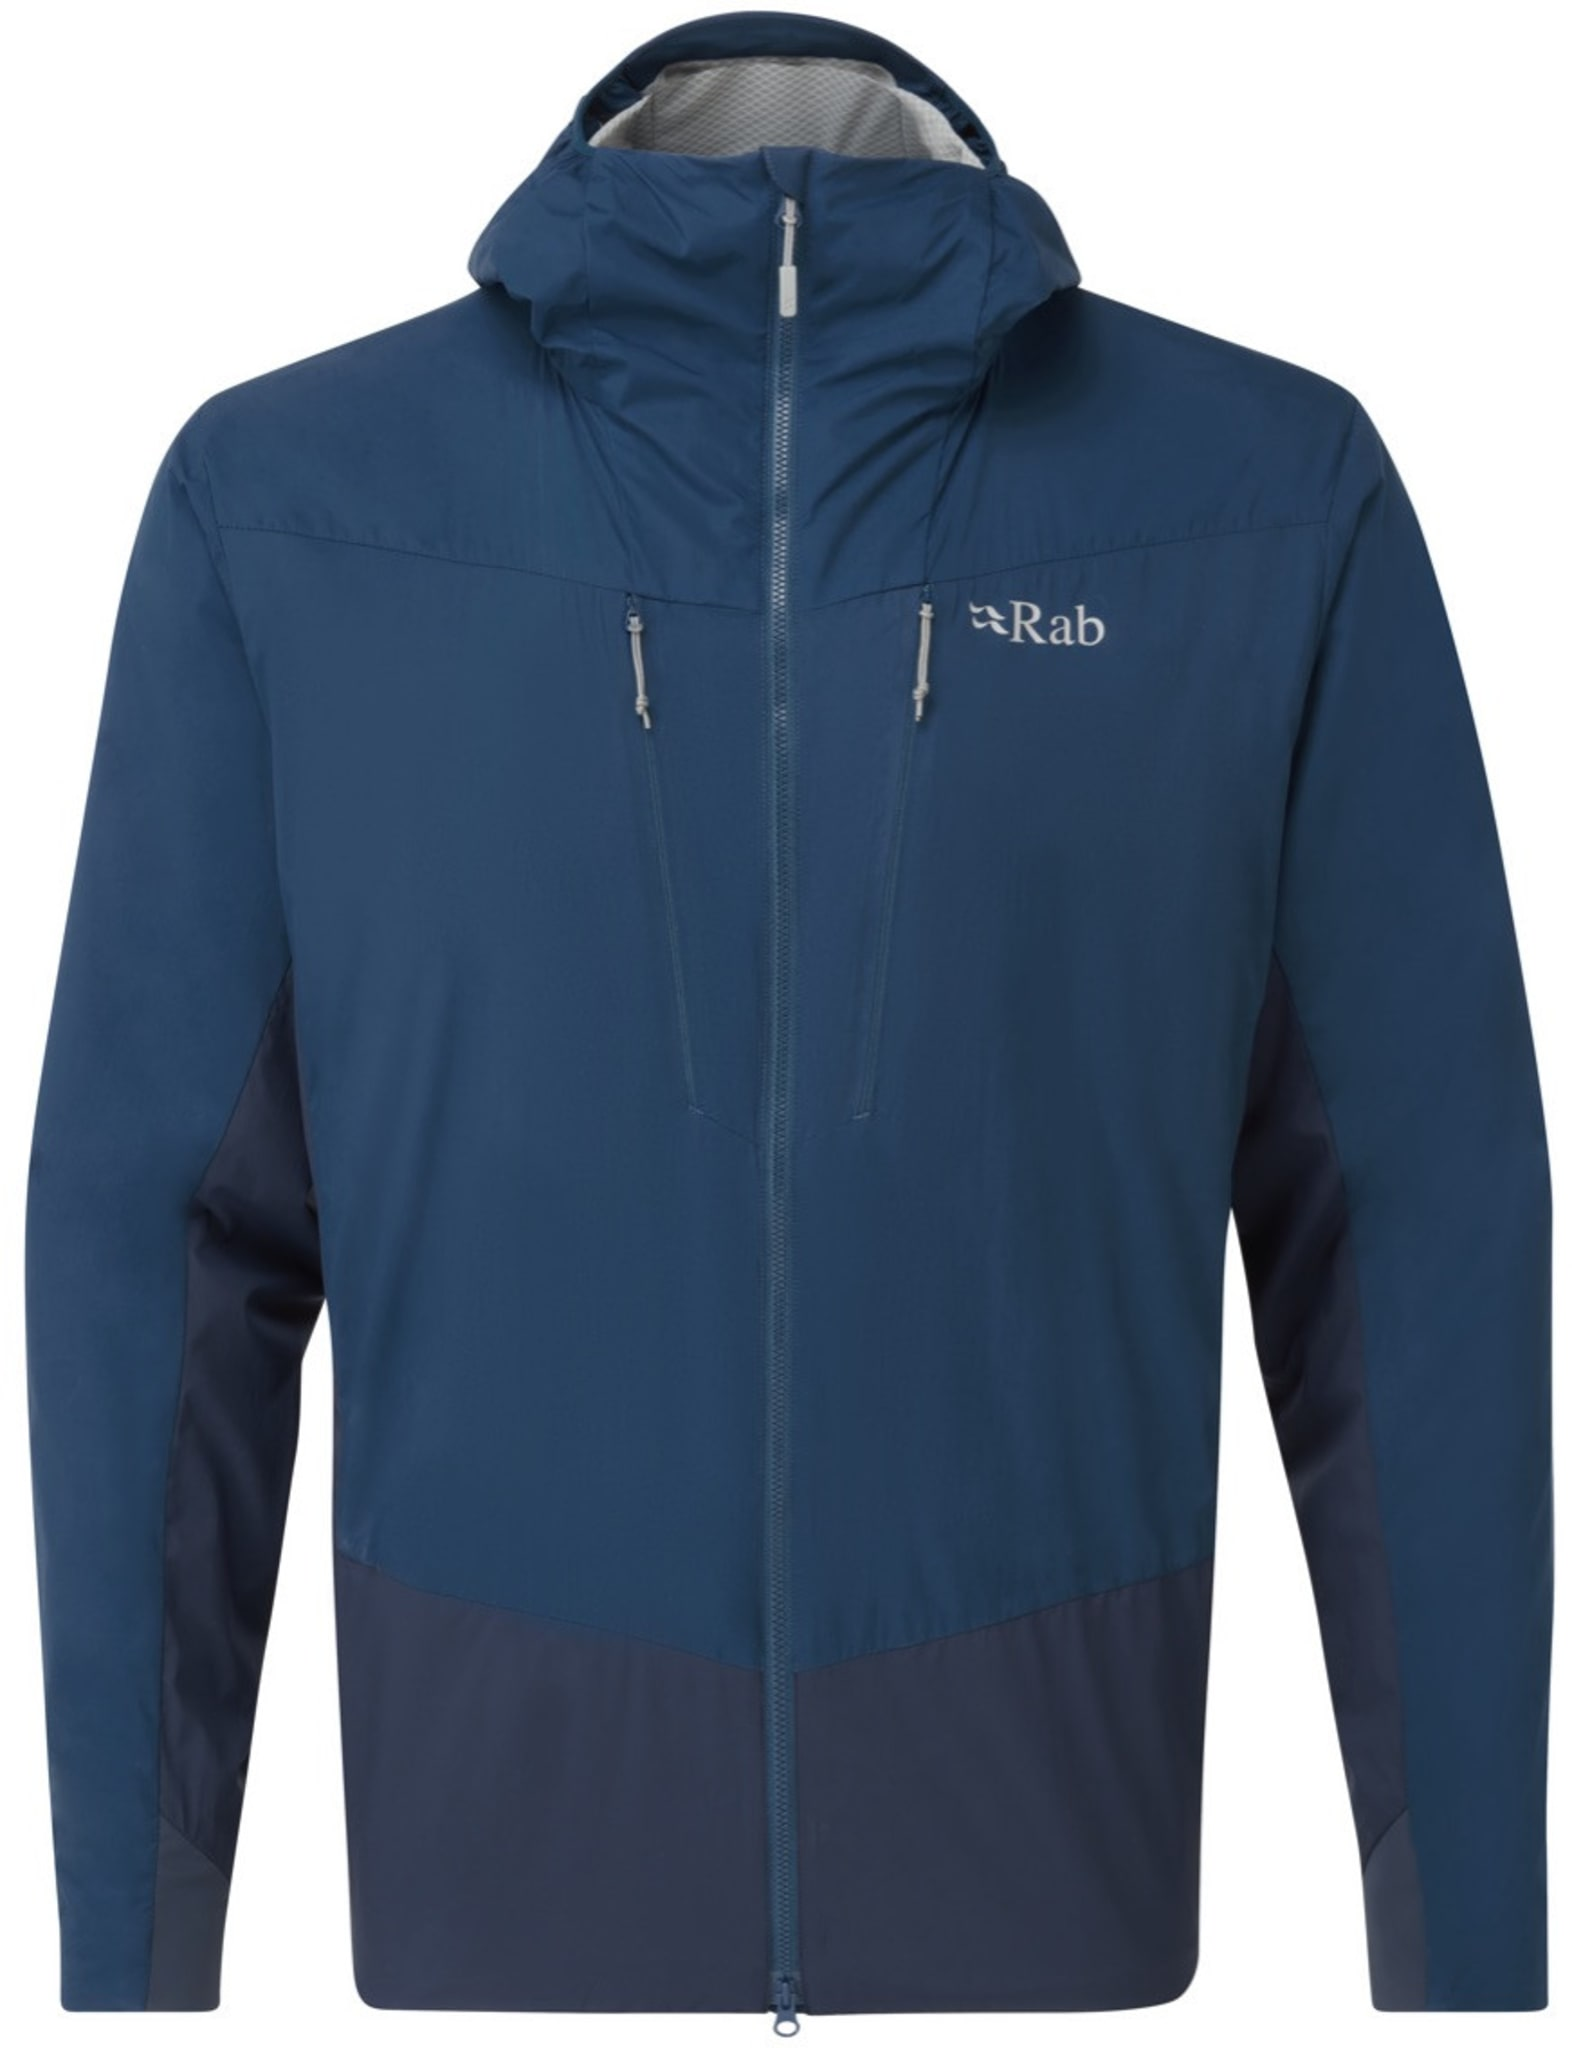 Teknisk jakke med optimal komfort